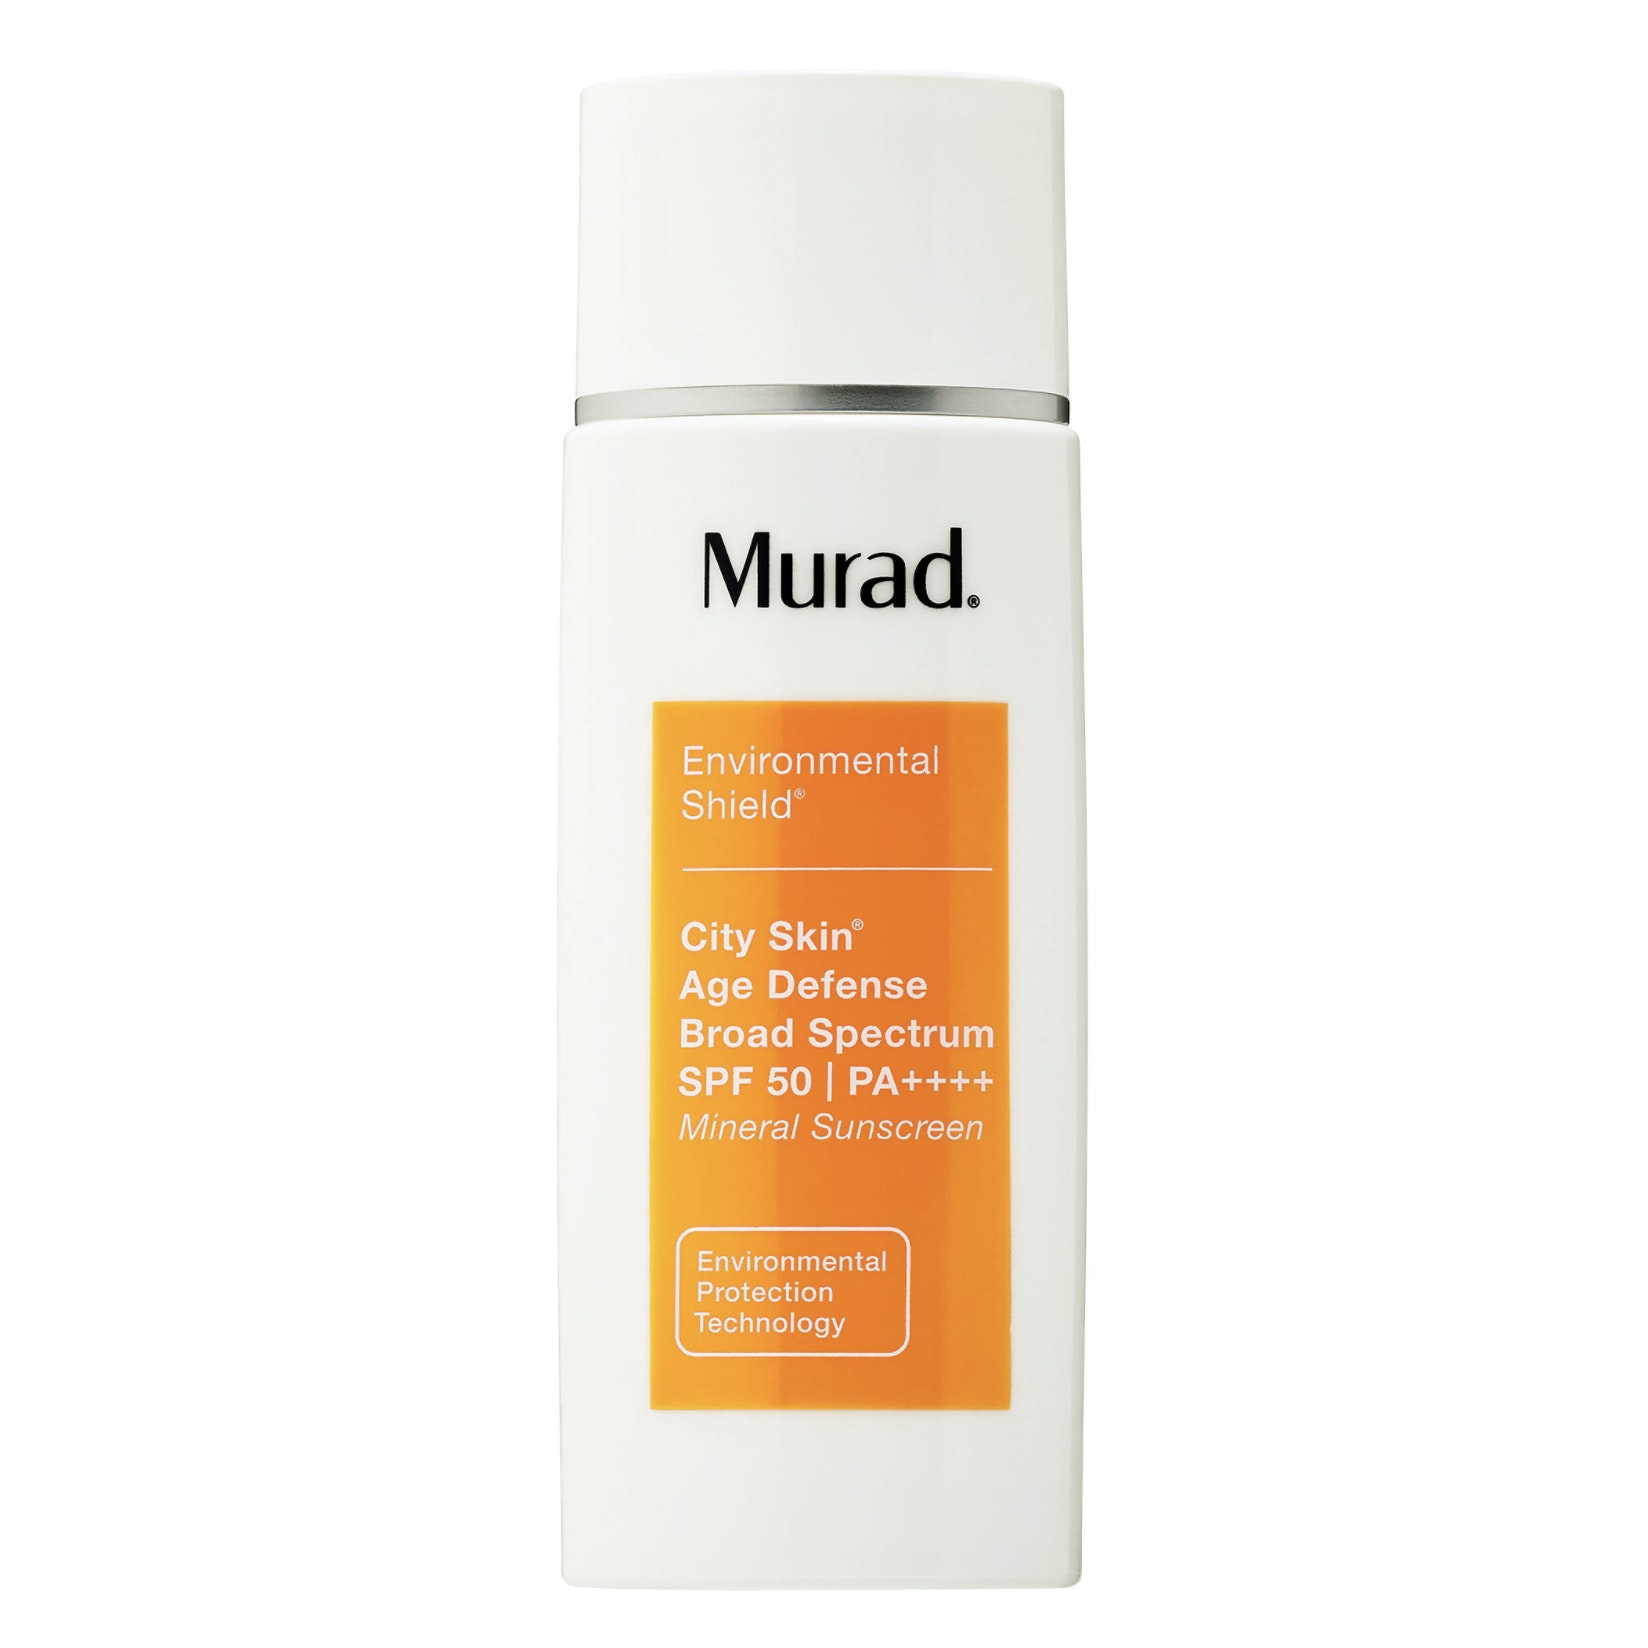 Murad® City Skin® Age Defense Broad Spectrum SPF 50 PA ++++